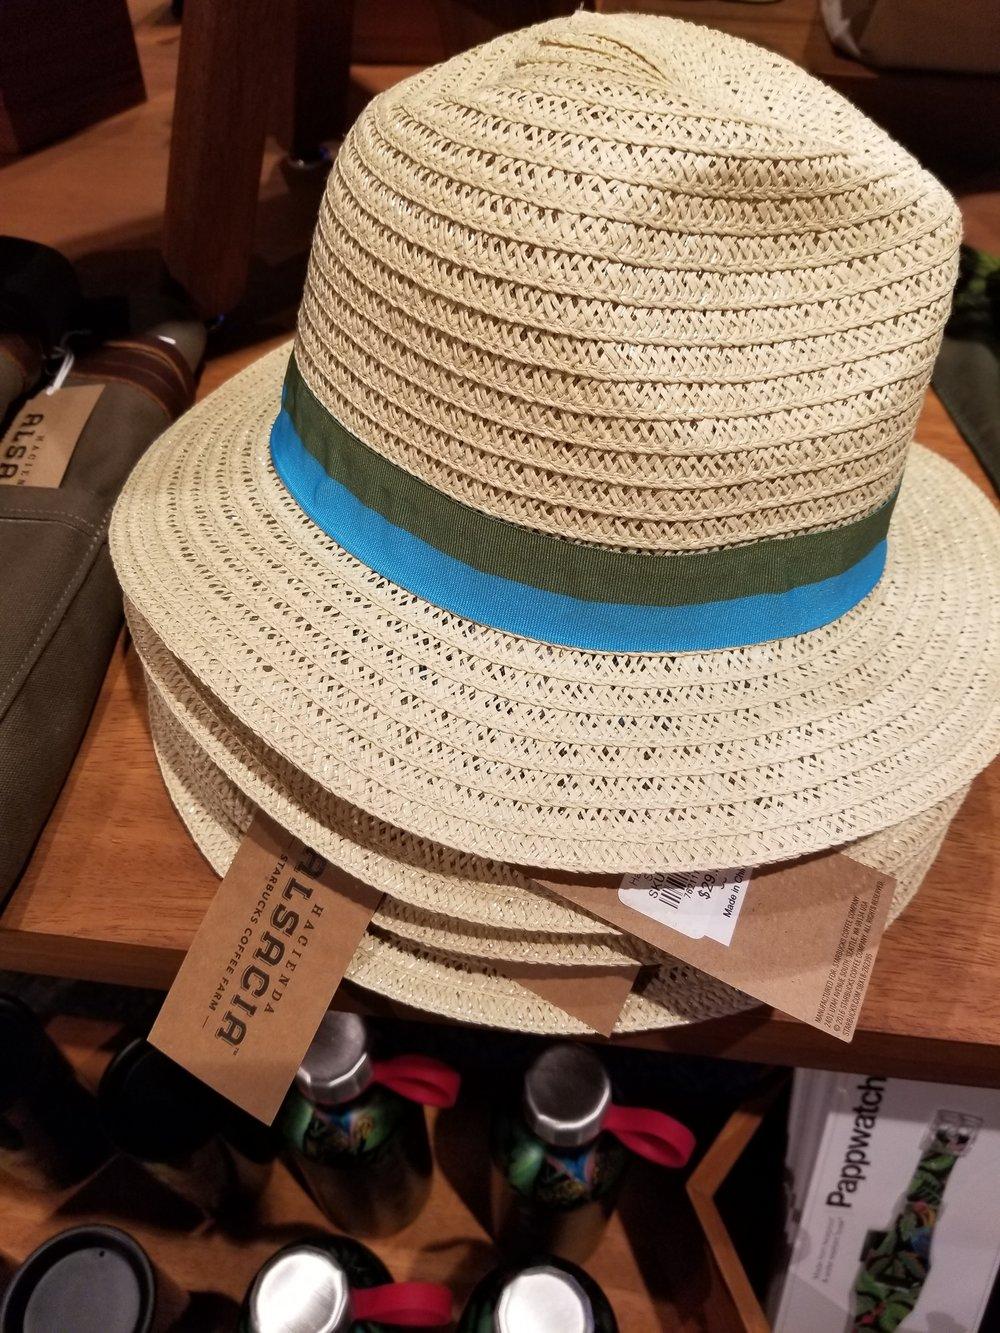 2018 March 7 straw hat inspired by costa rica hacienda alsacia.jpg